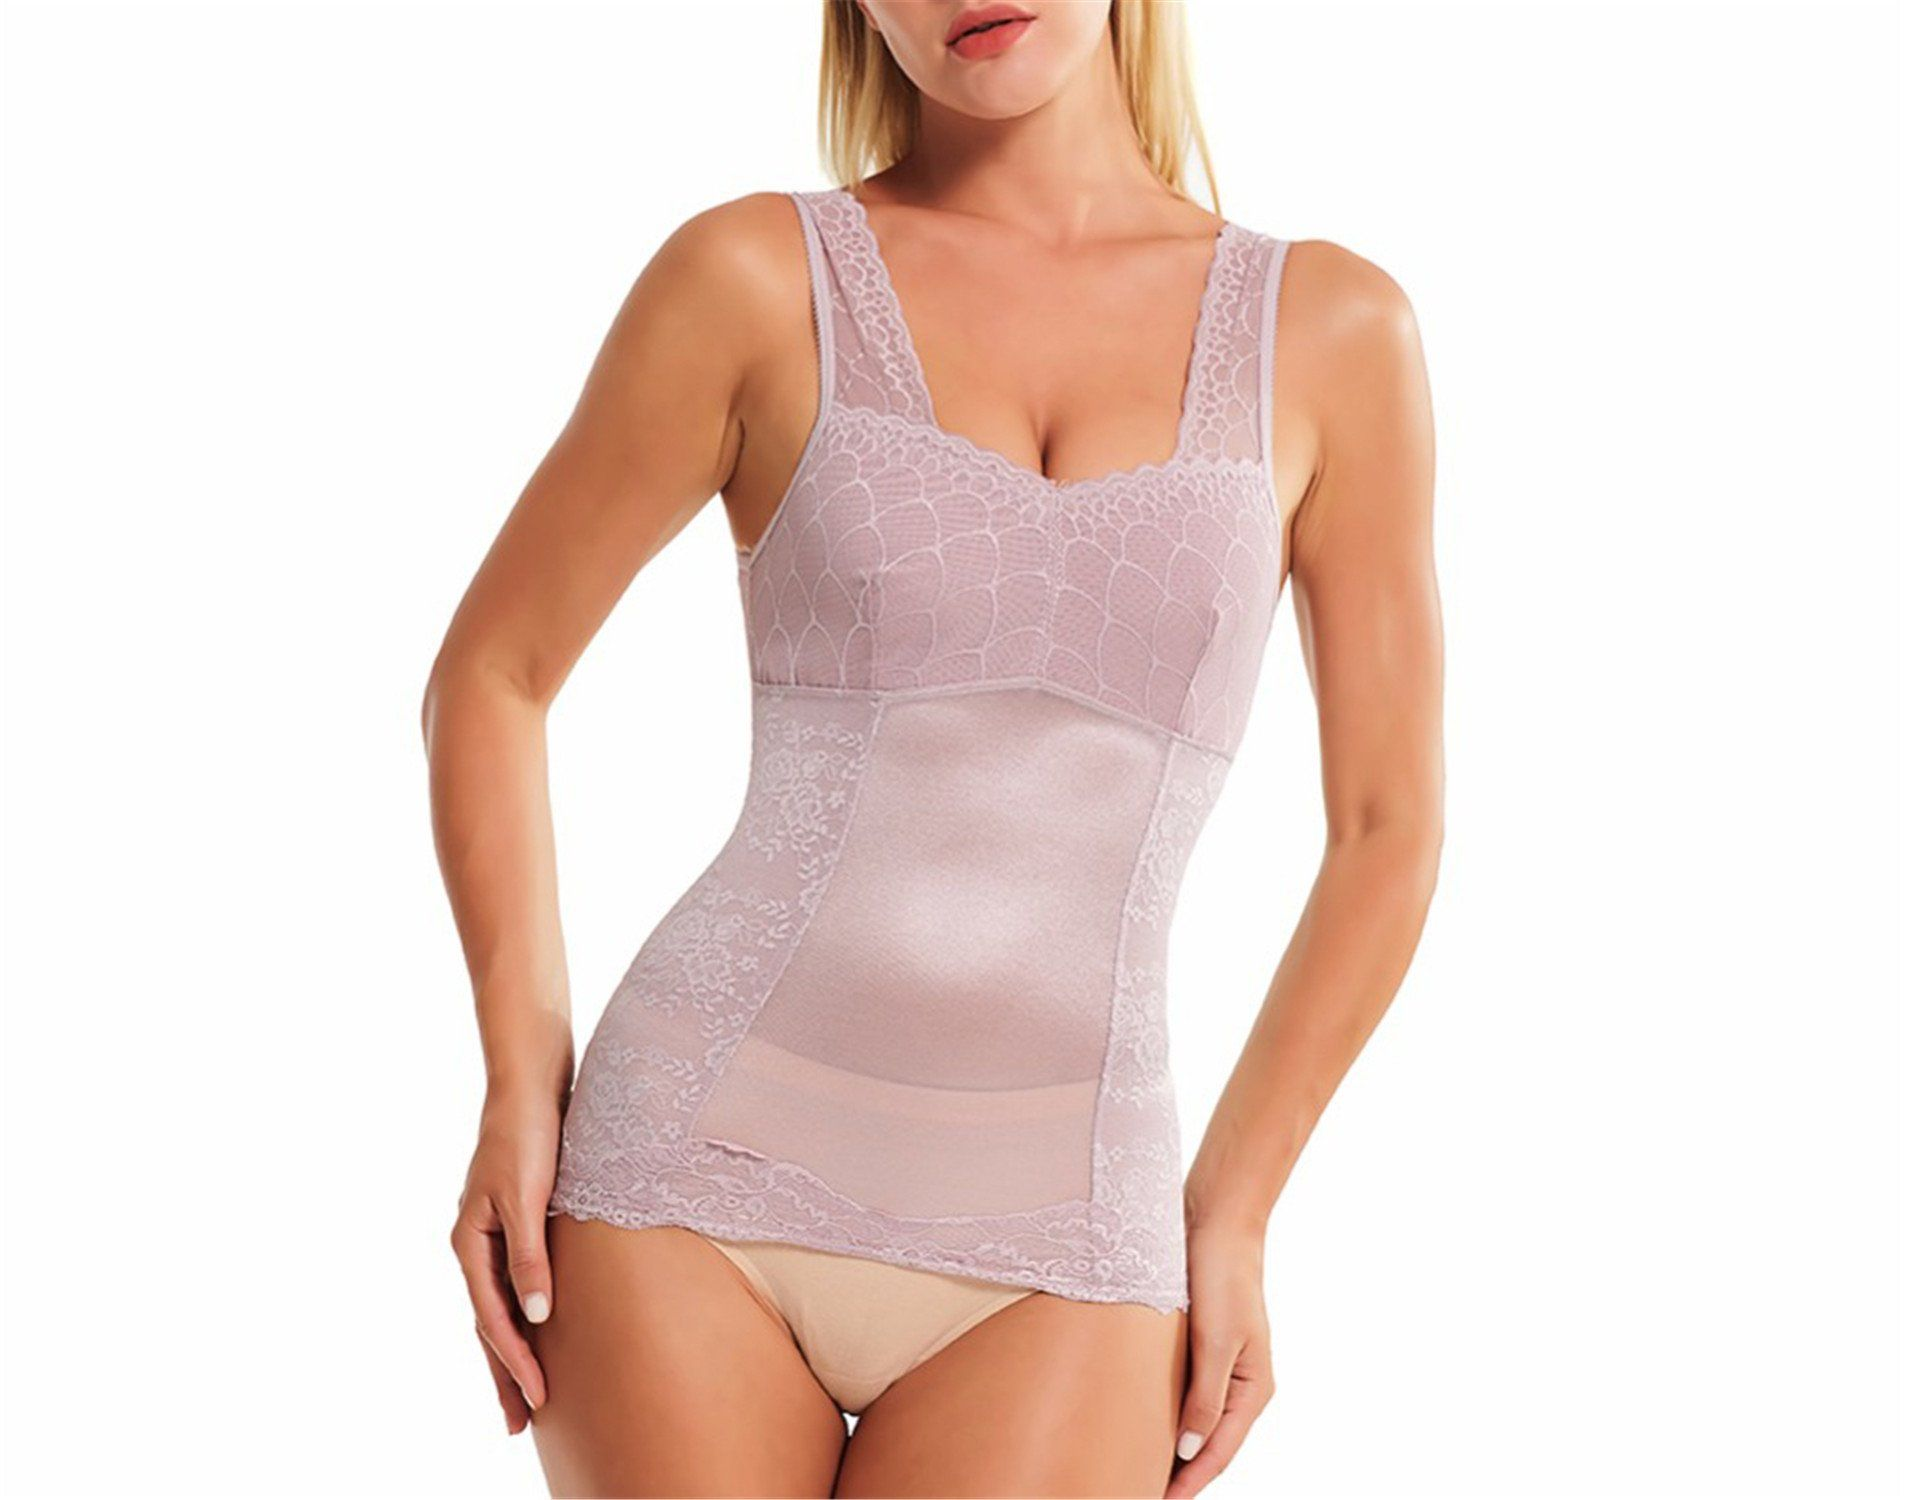 ef403e2ed6 Doris Batchelor Fashion Women Underwears Shapewear Slimming Underwear  Bodysuit Women Shaper Tummy Slimming Shaper Underwearfu XL    You can get  additional ...